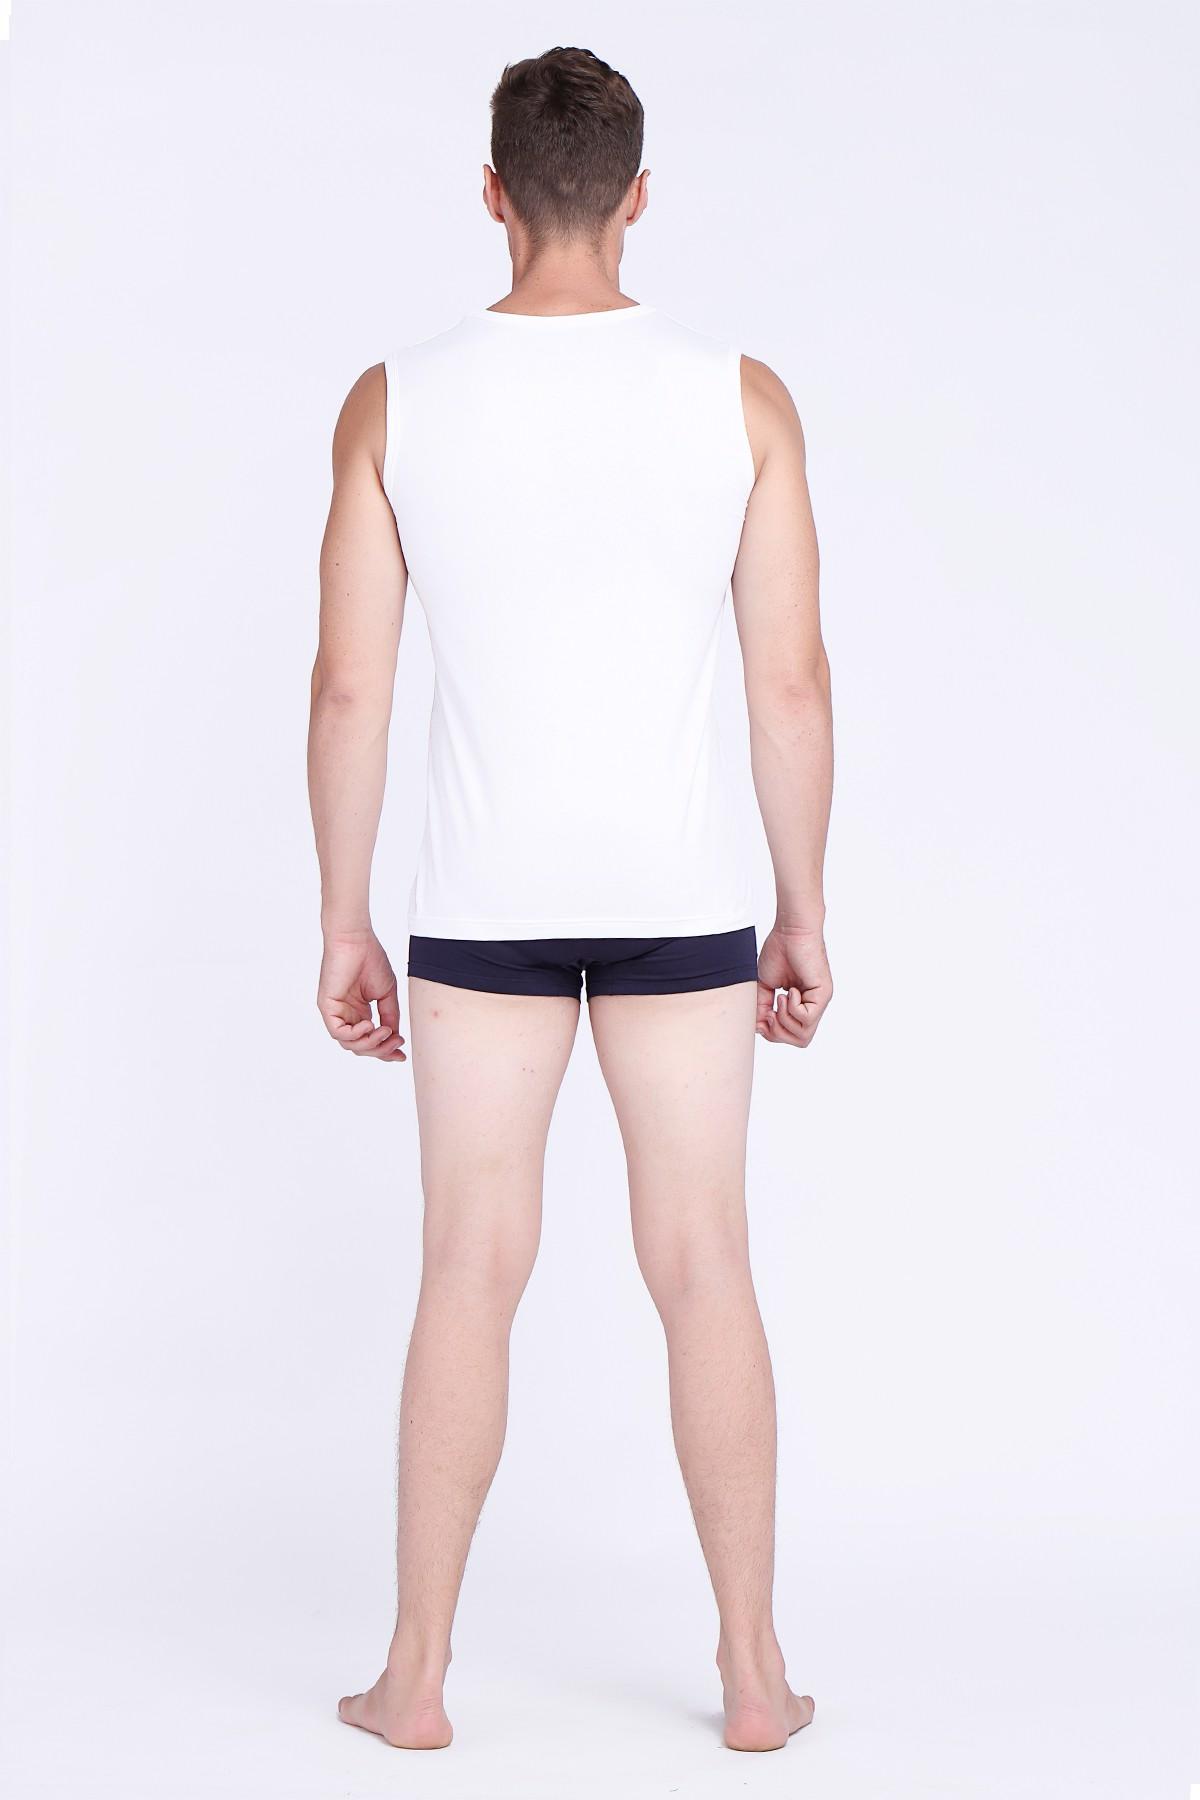 Áo T - Shirt nam Jockey Cotton compact in Haft boy - 7338